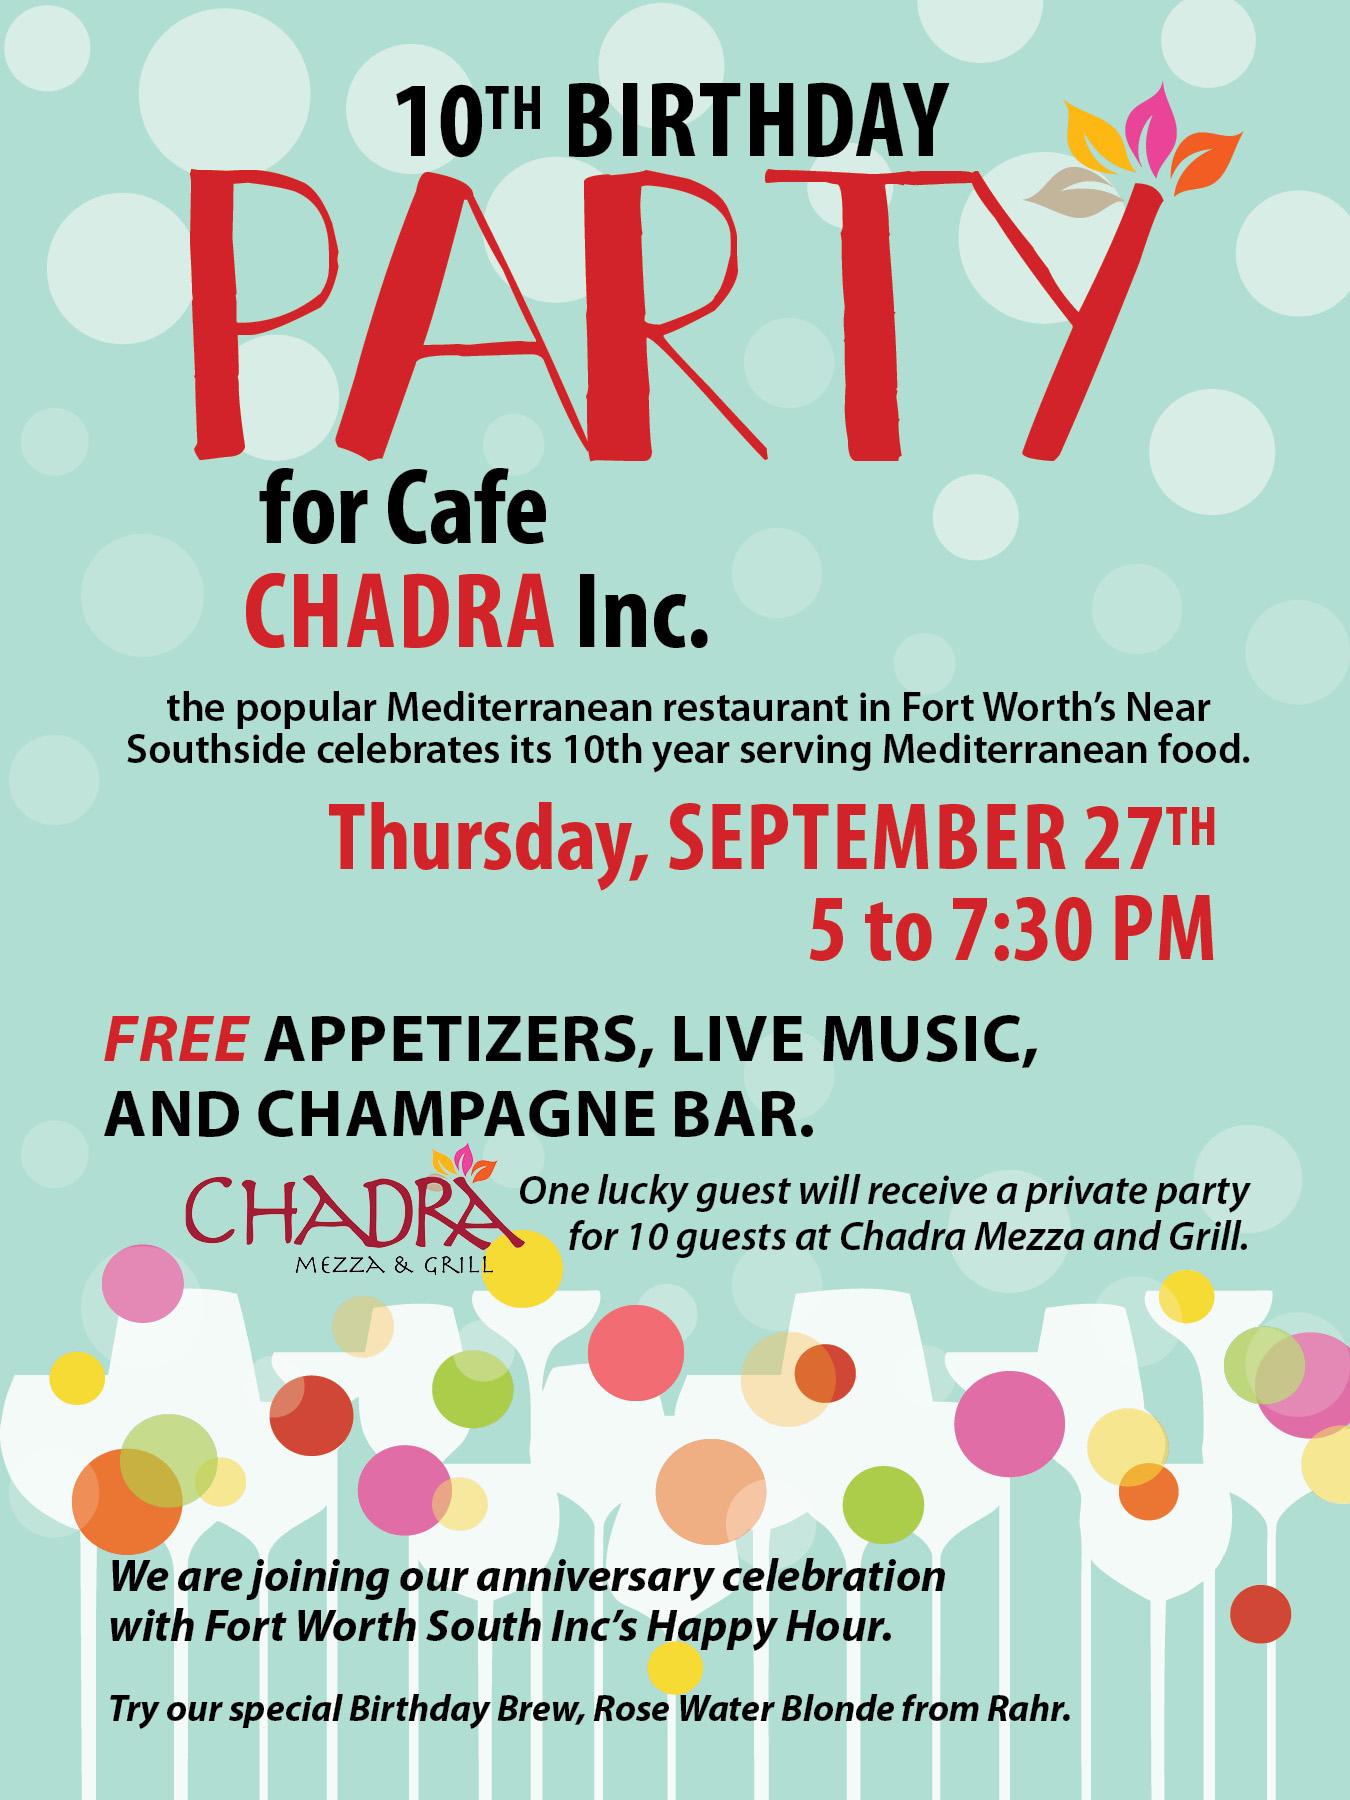 Chadra Bday Party 2